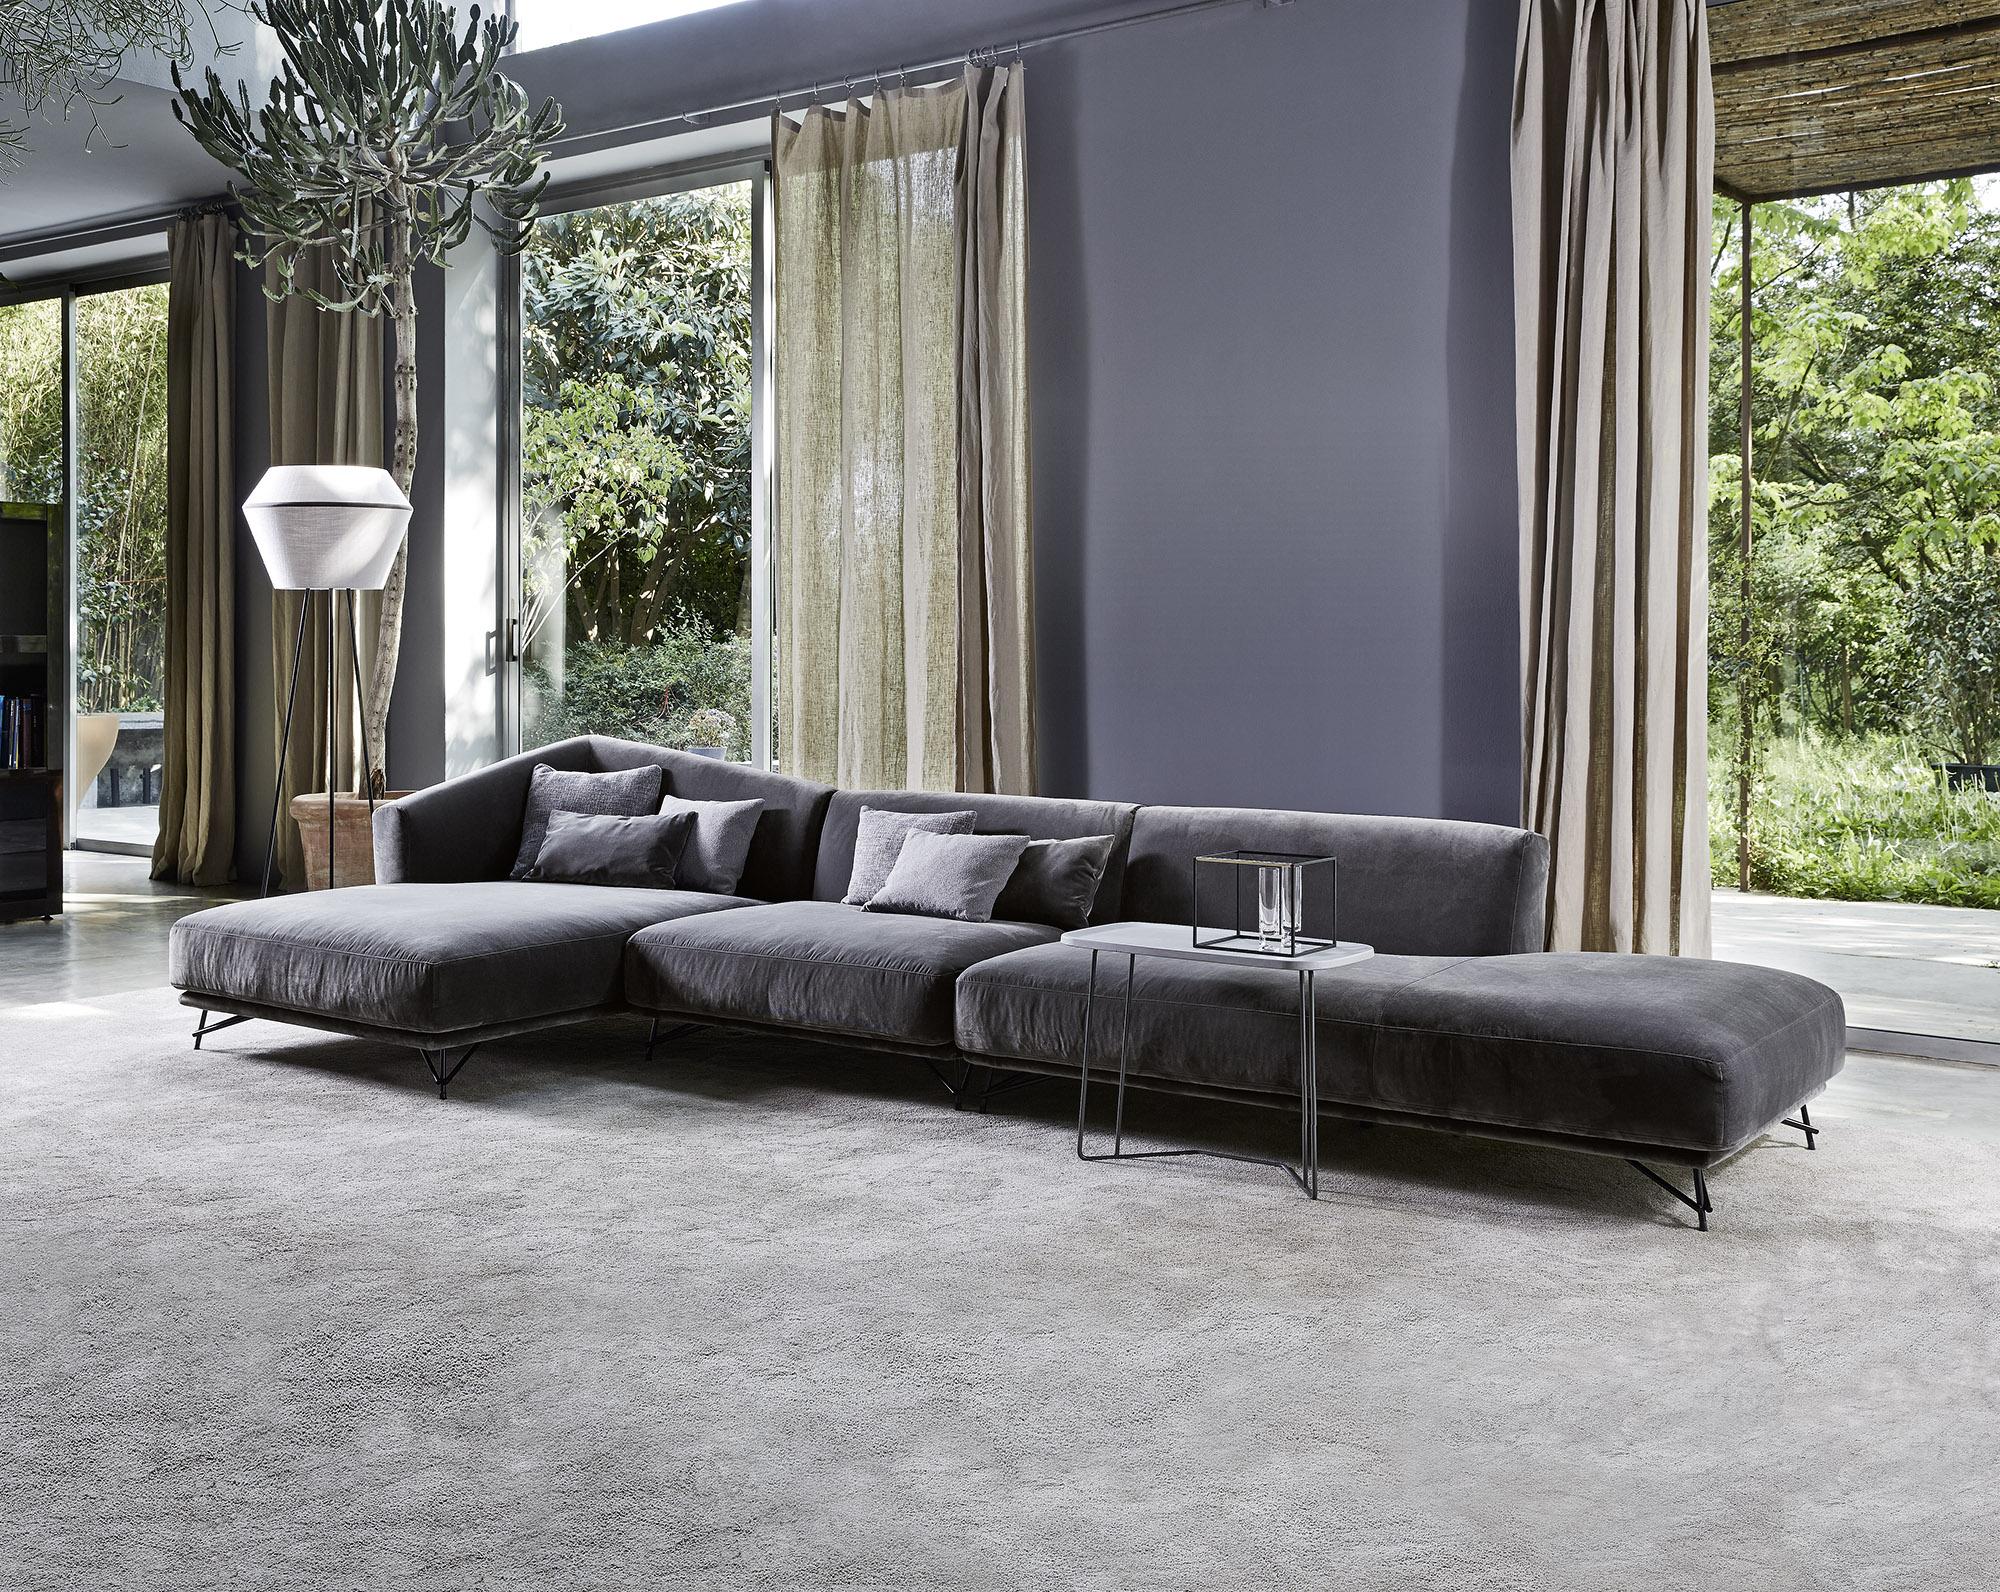 lennox-sofa-with-chaise-longue-ditre-italia-263474-relecaa5cb0.jpg